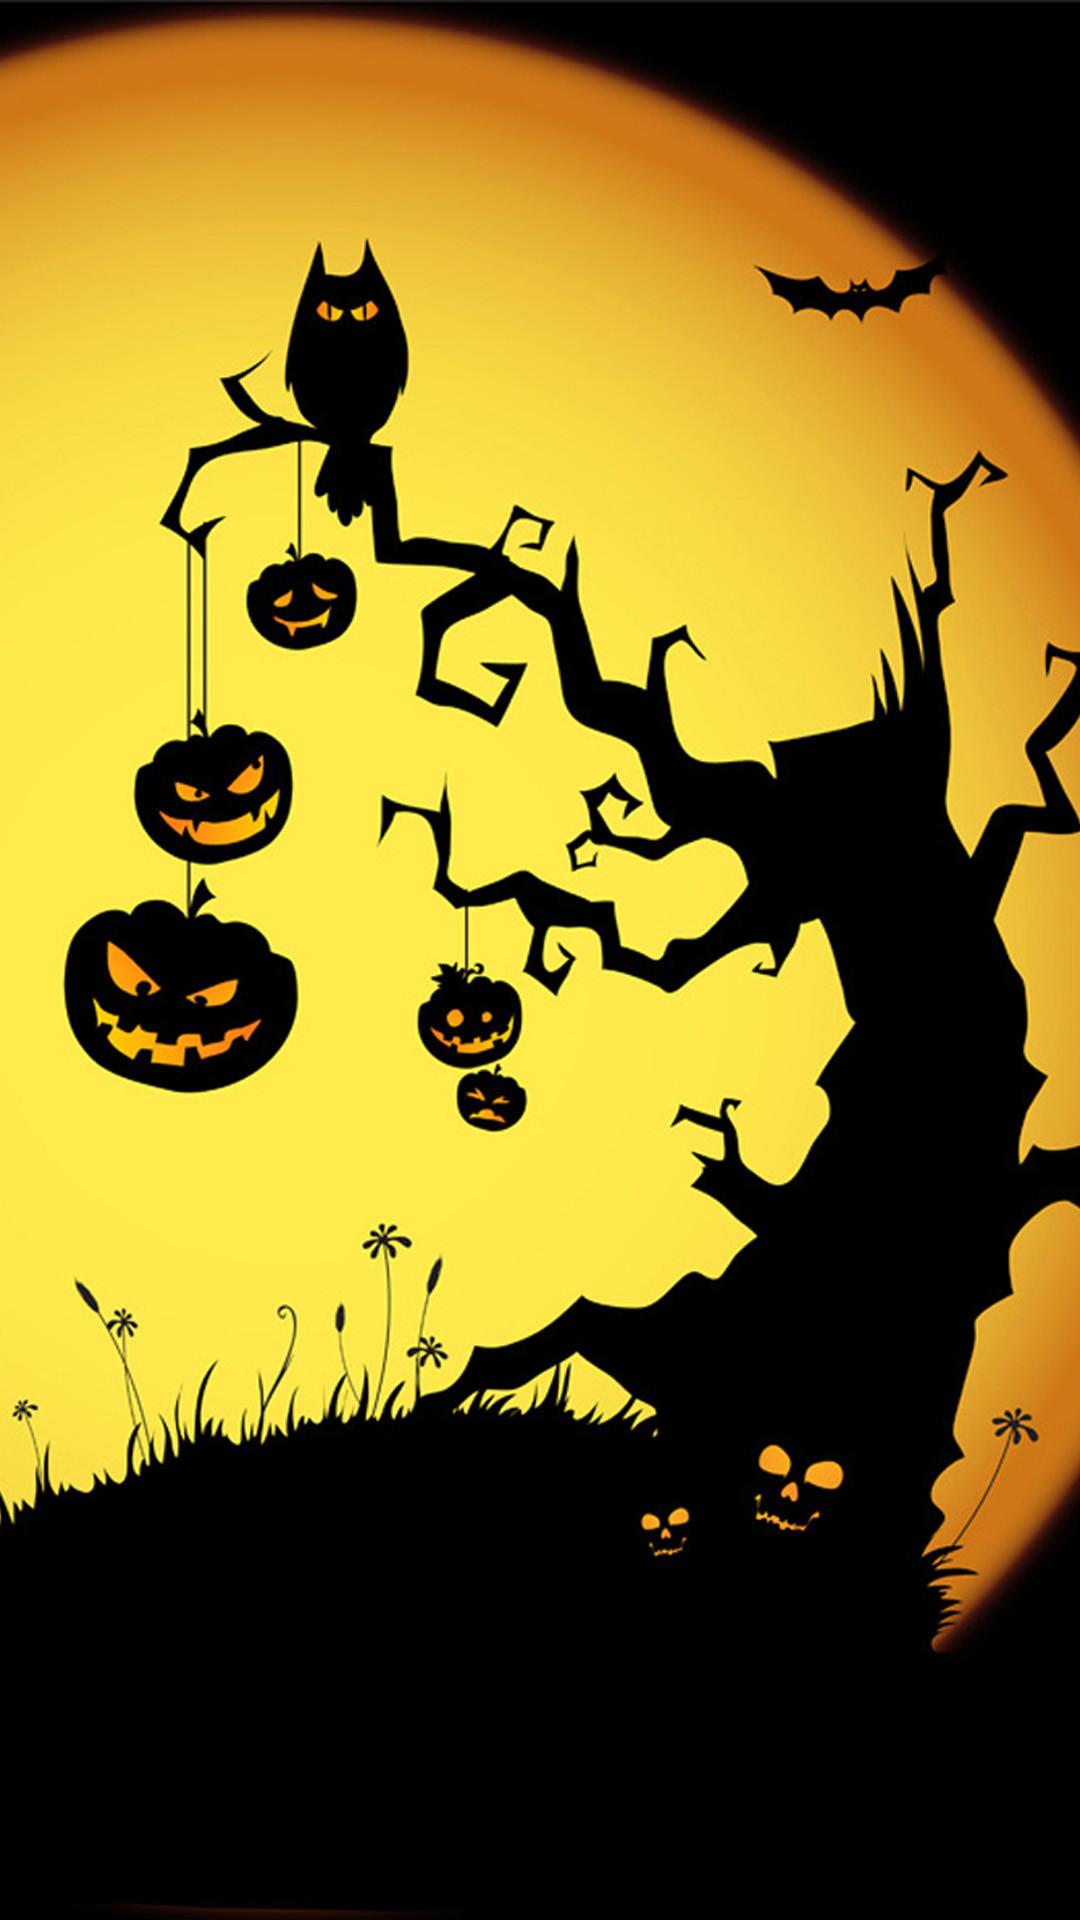 Cute Candy Corn Wallpaper Cute Halloween Iphone Wallpaper 81 Images